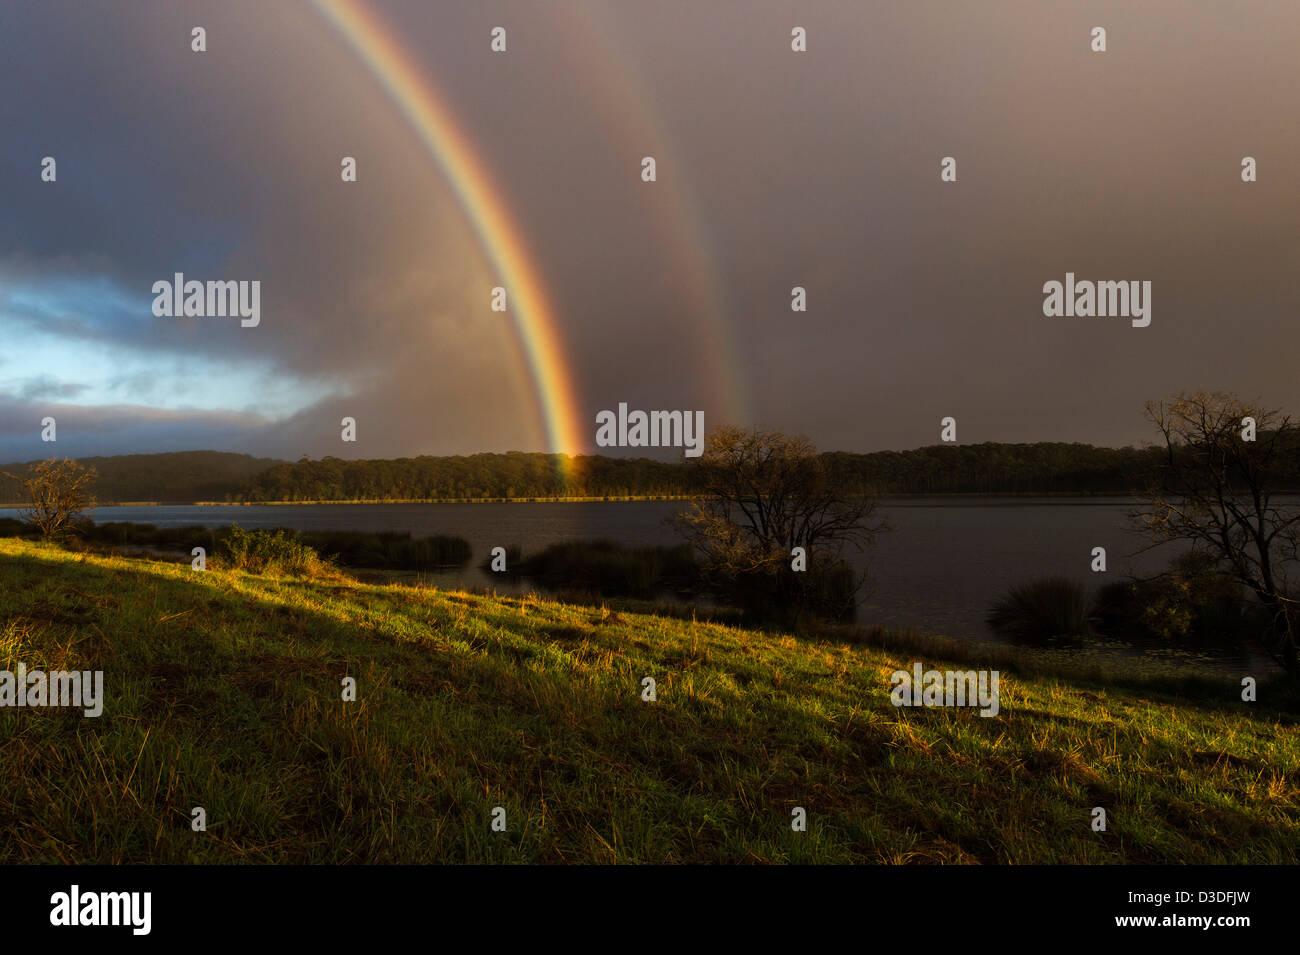 Rainbow over dam, QLD Australia - Stock Image